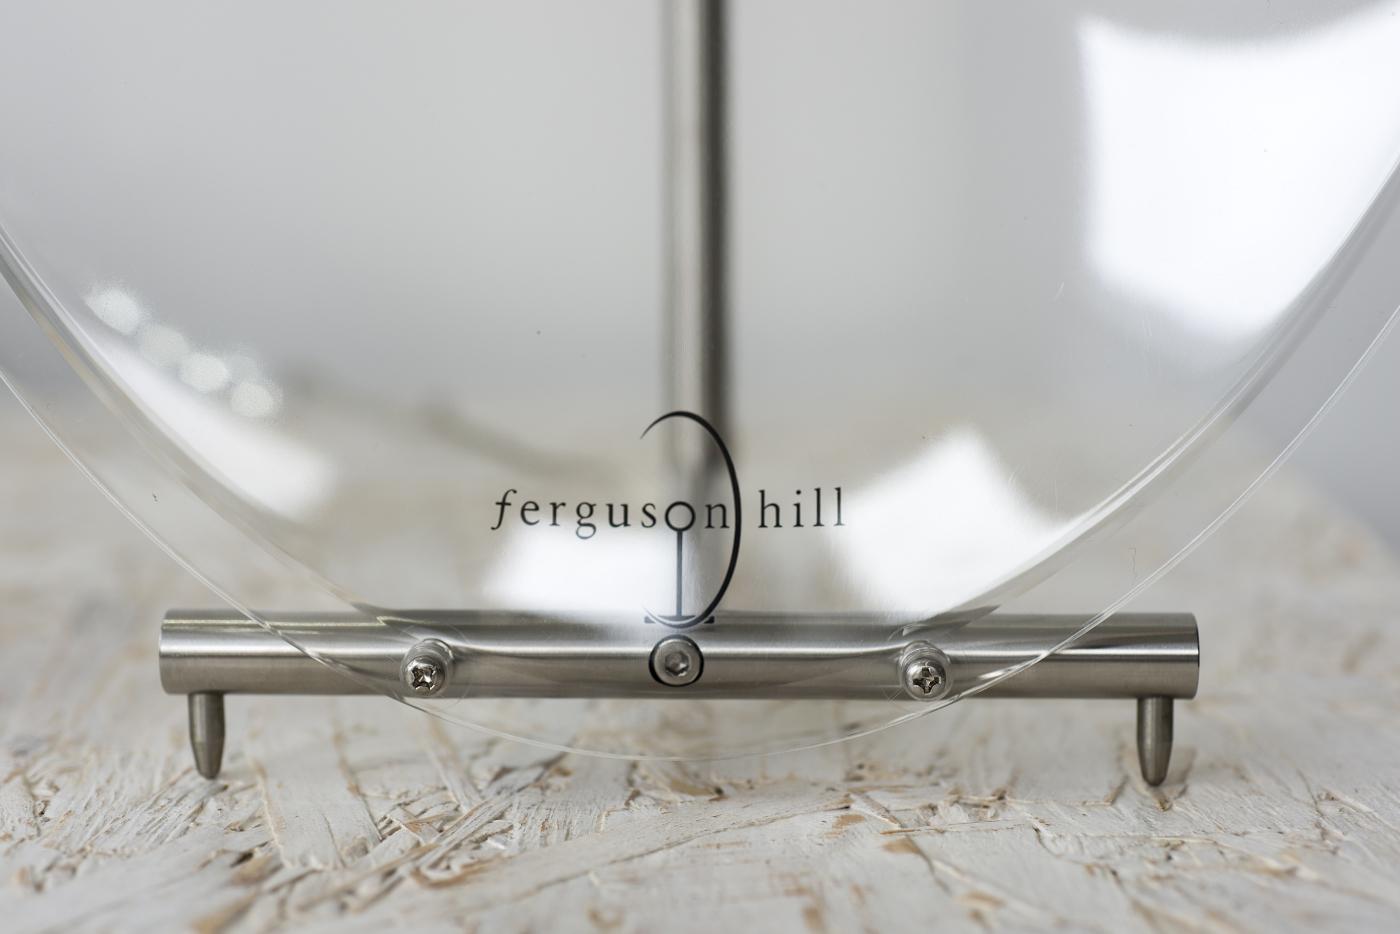 ferguson-hill-hifi-system-5.JPG